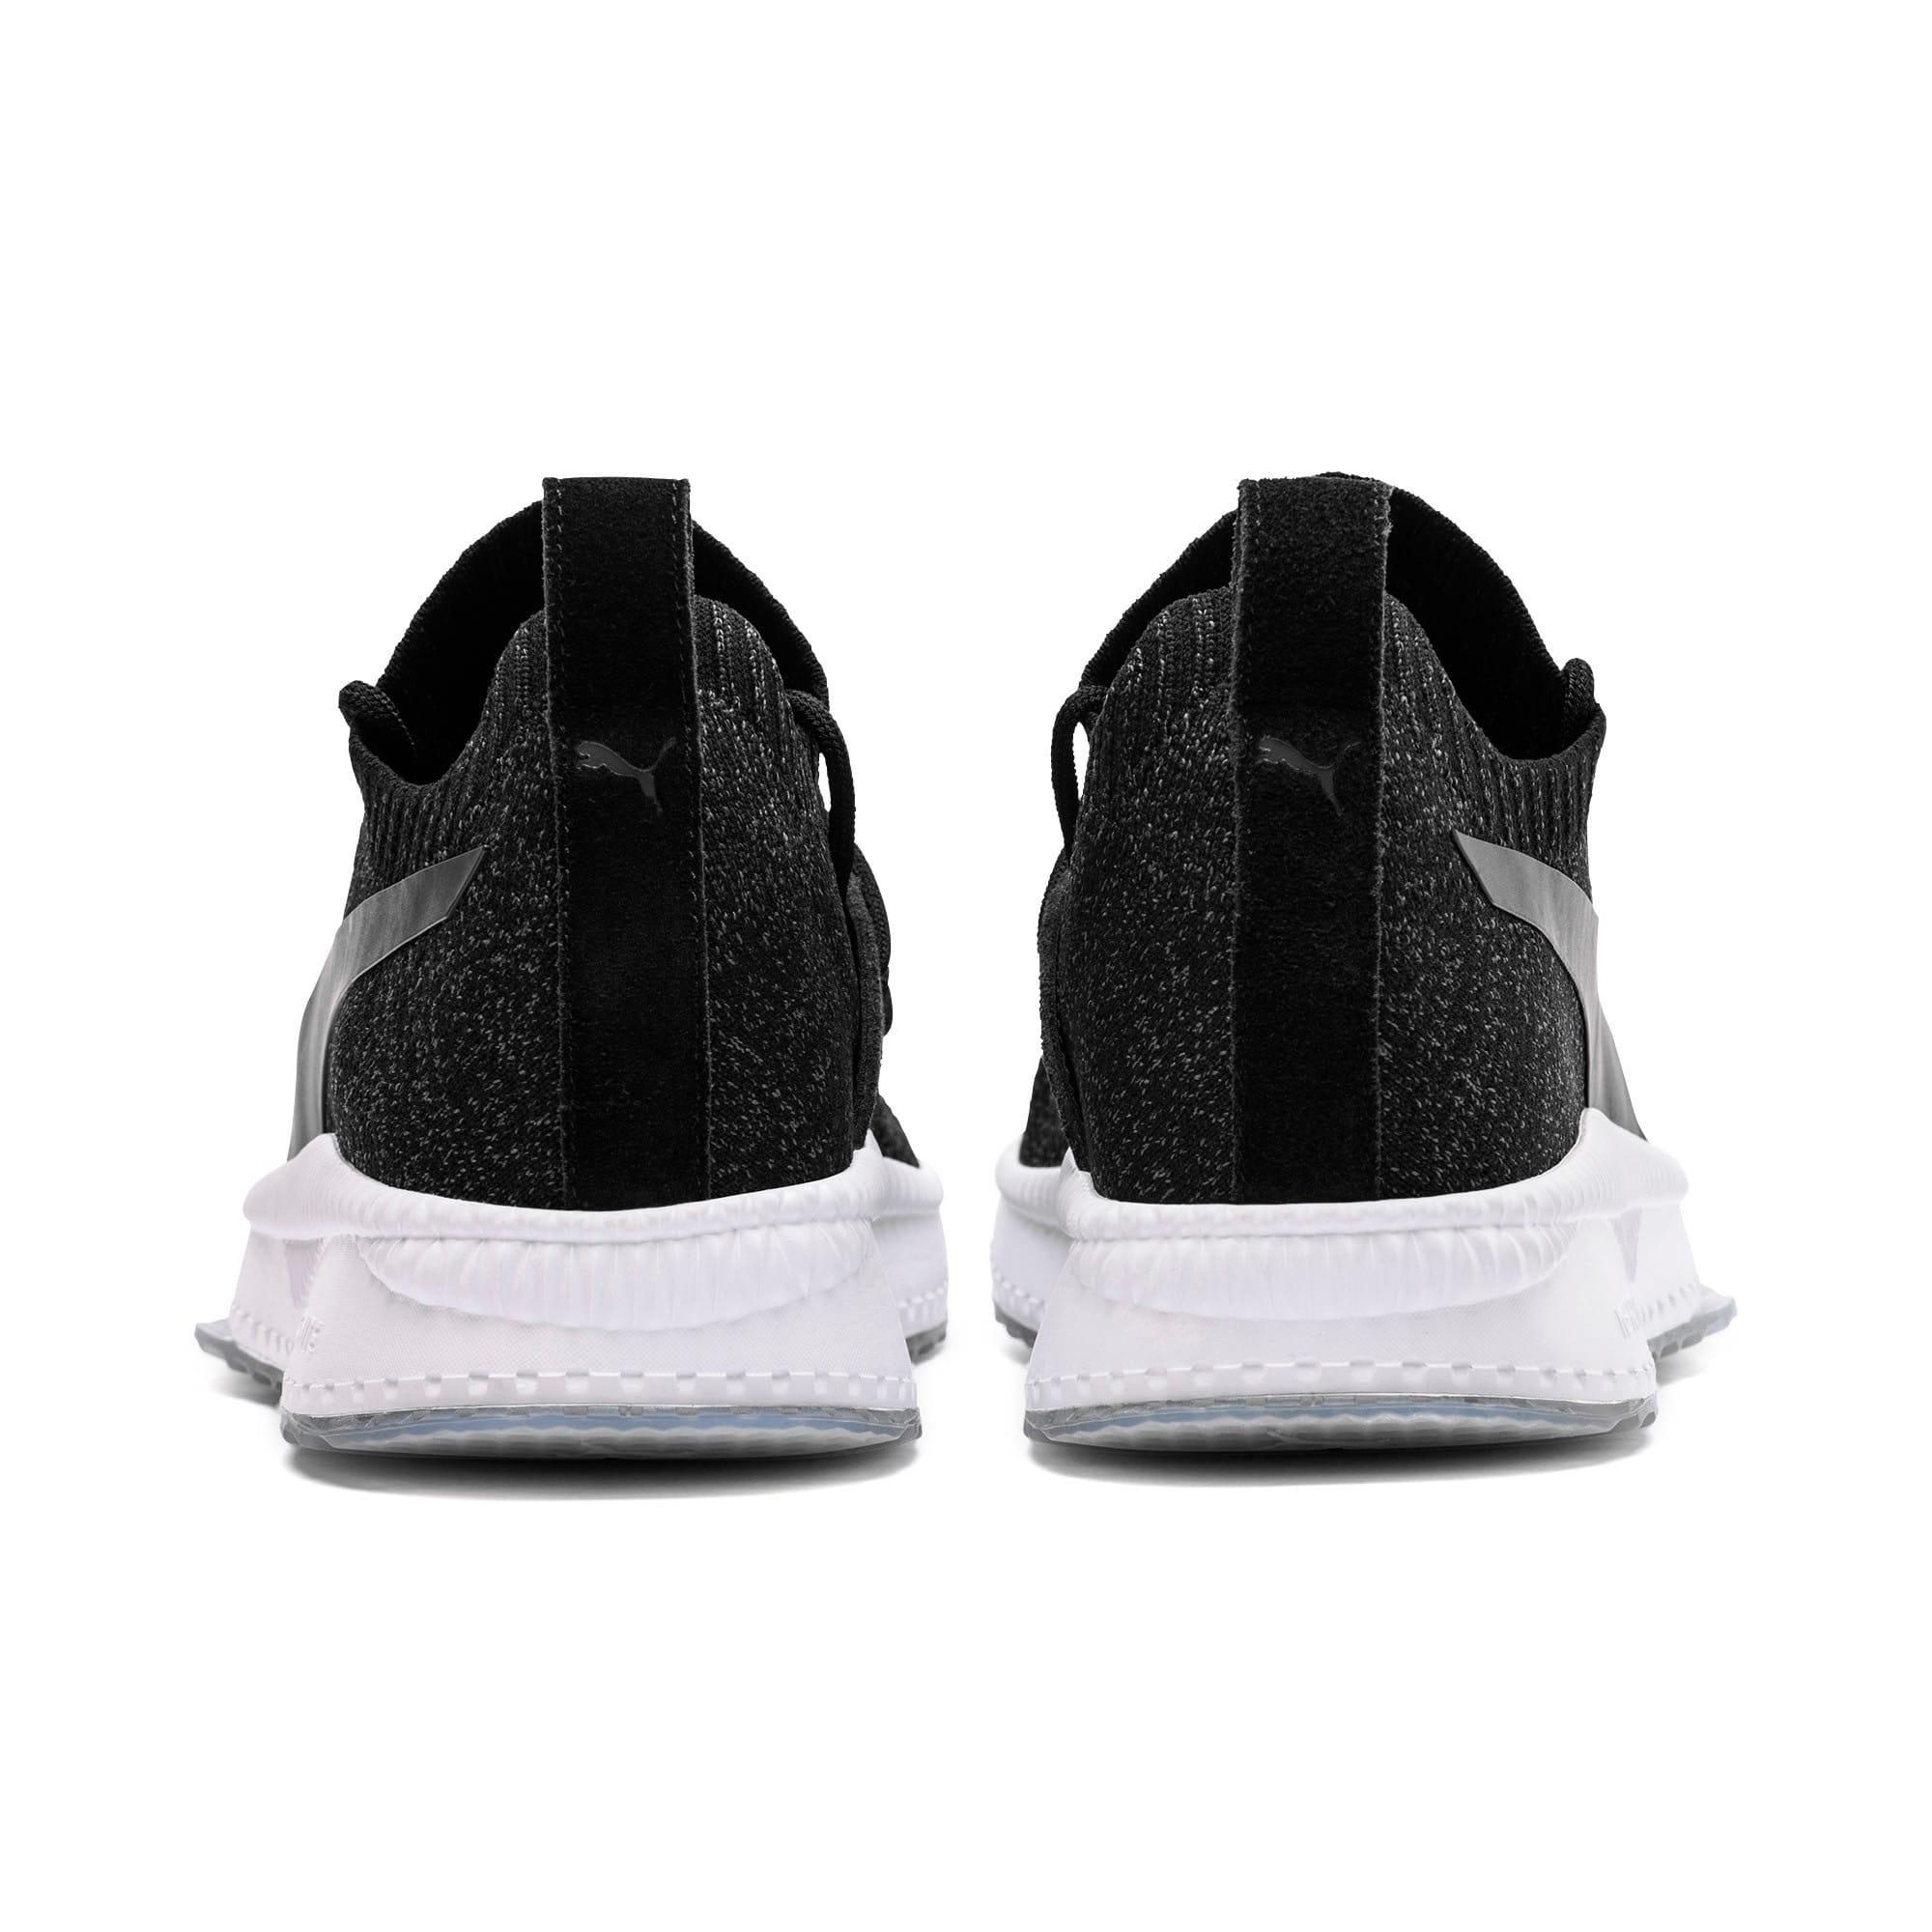 Thumbnail 4 of TSUGI Apex evoKNIT Men's Sneakers, Puma Black-Iron Gate, medium